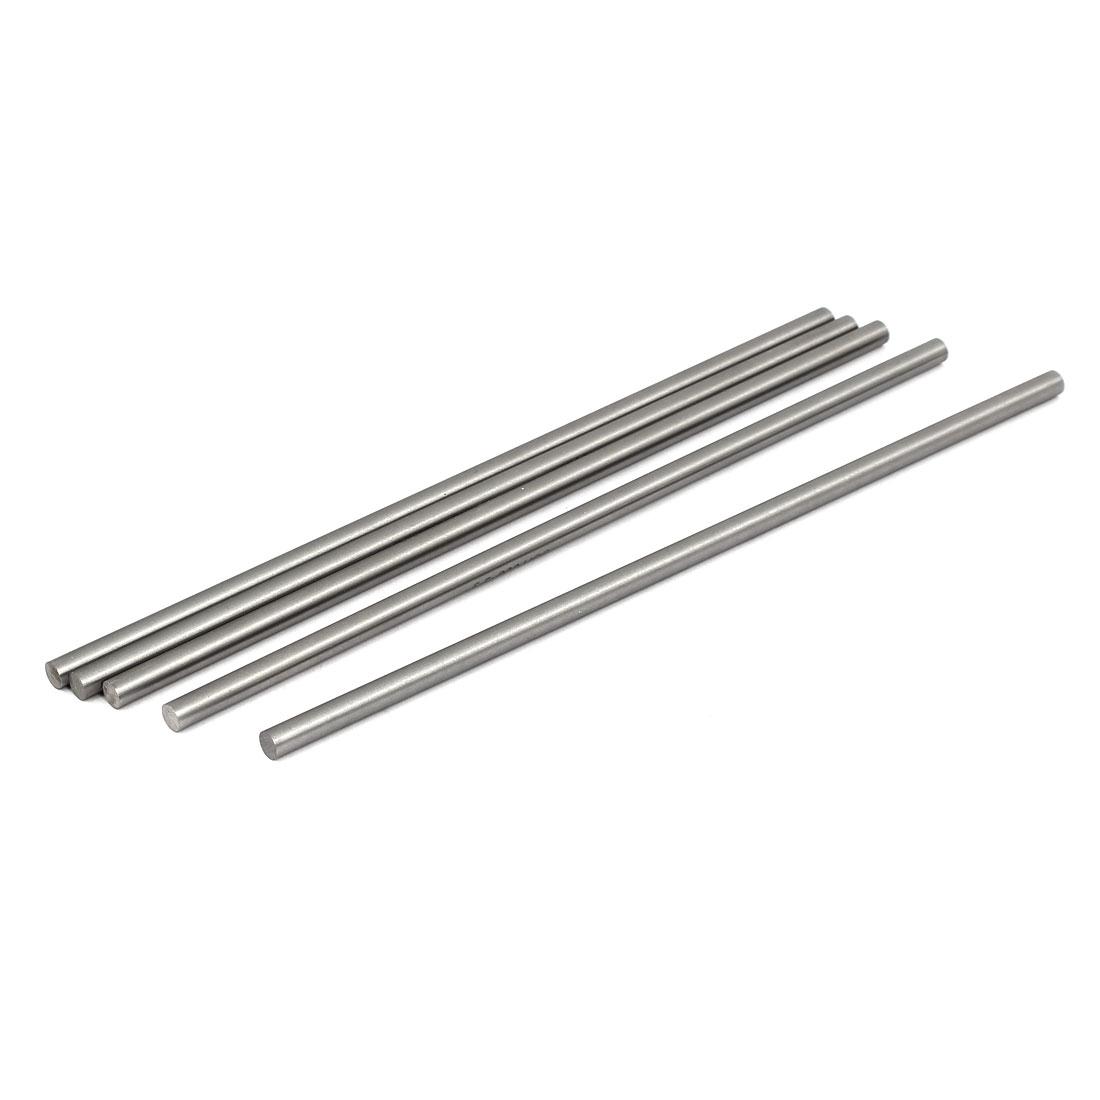 5mm Dia 200mm Length HSS Round Shaft Rod Bar Lathe Tools Gray 5pcs